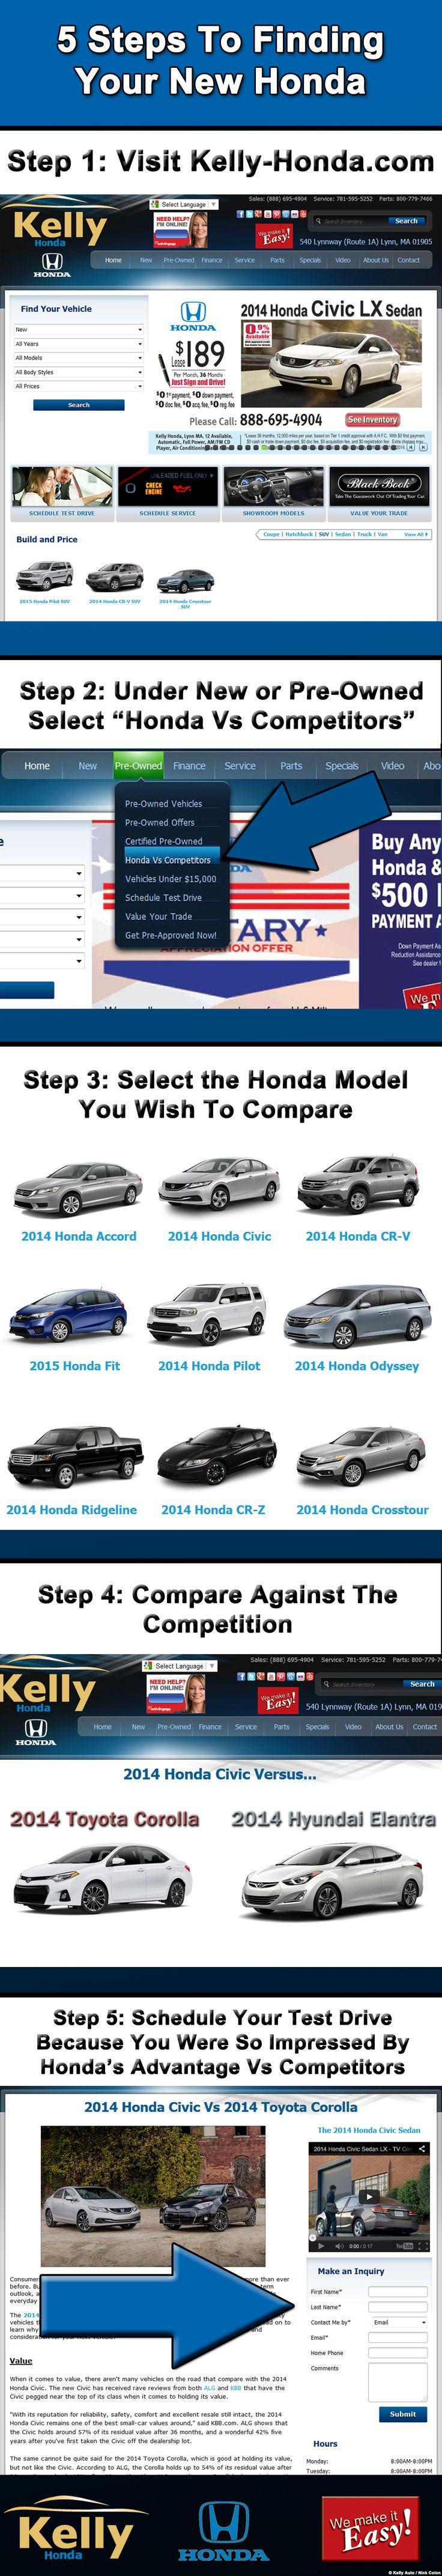 The easiest way to find your next vehicle #Steps2UrHonda #KellyHonda